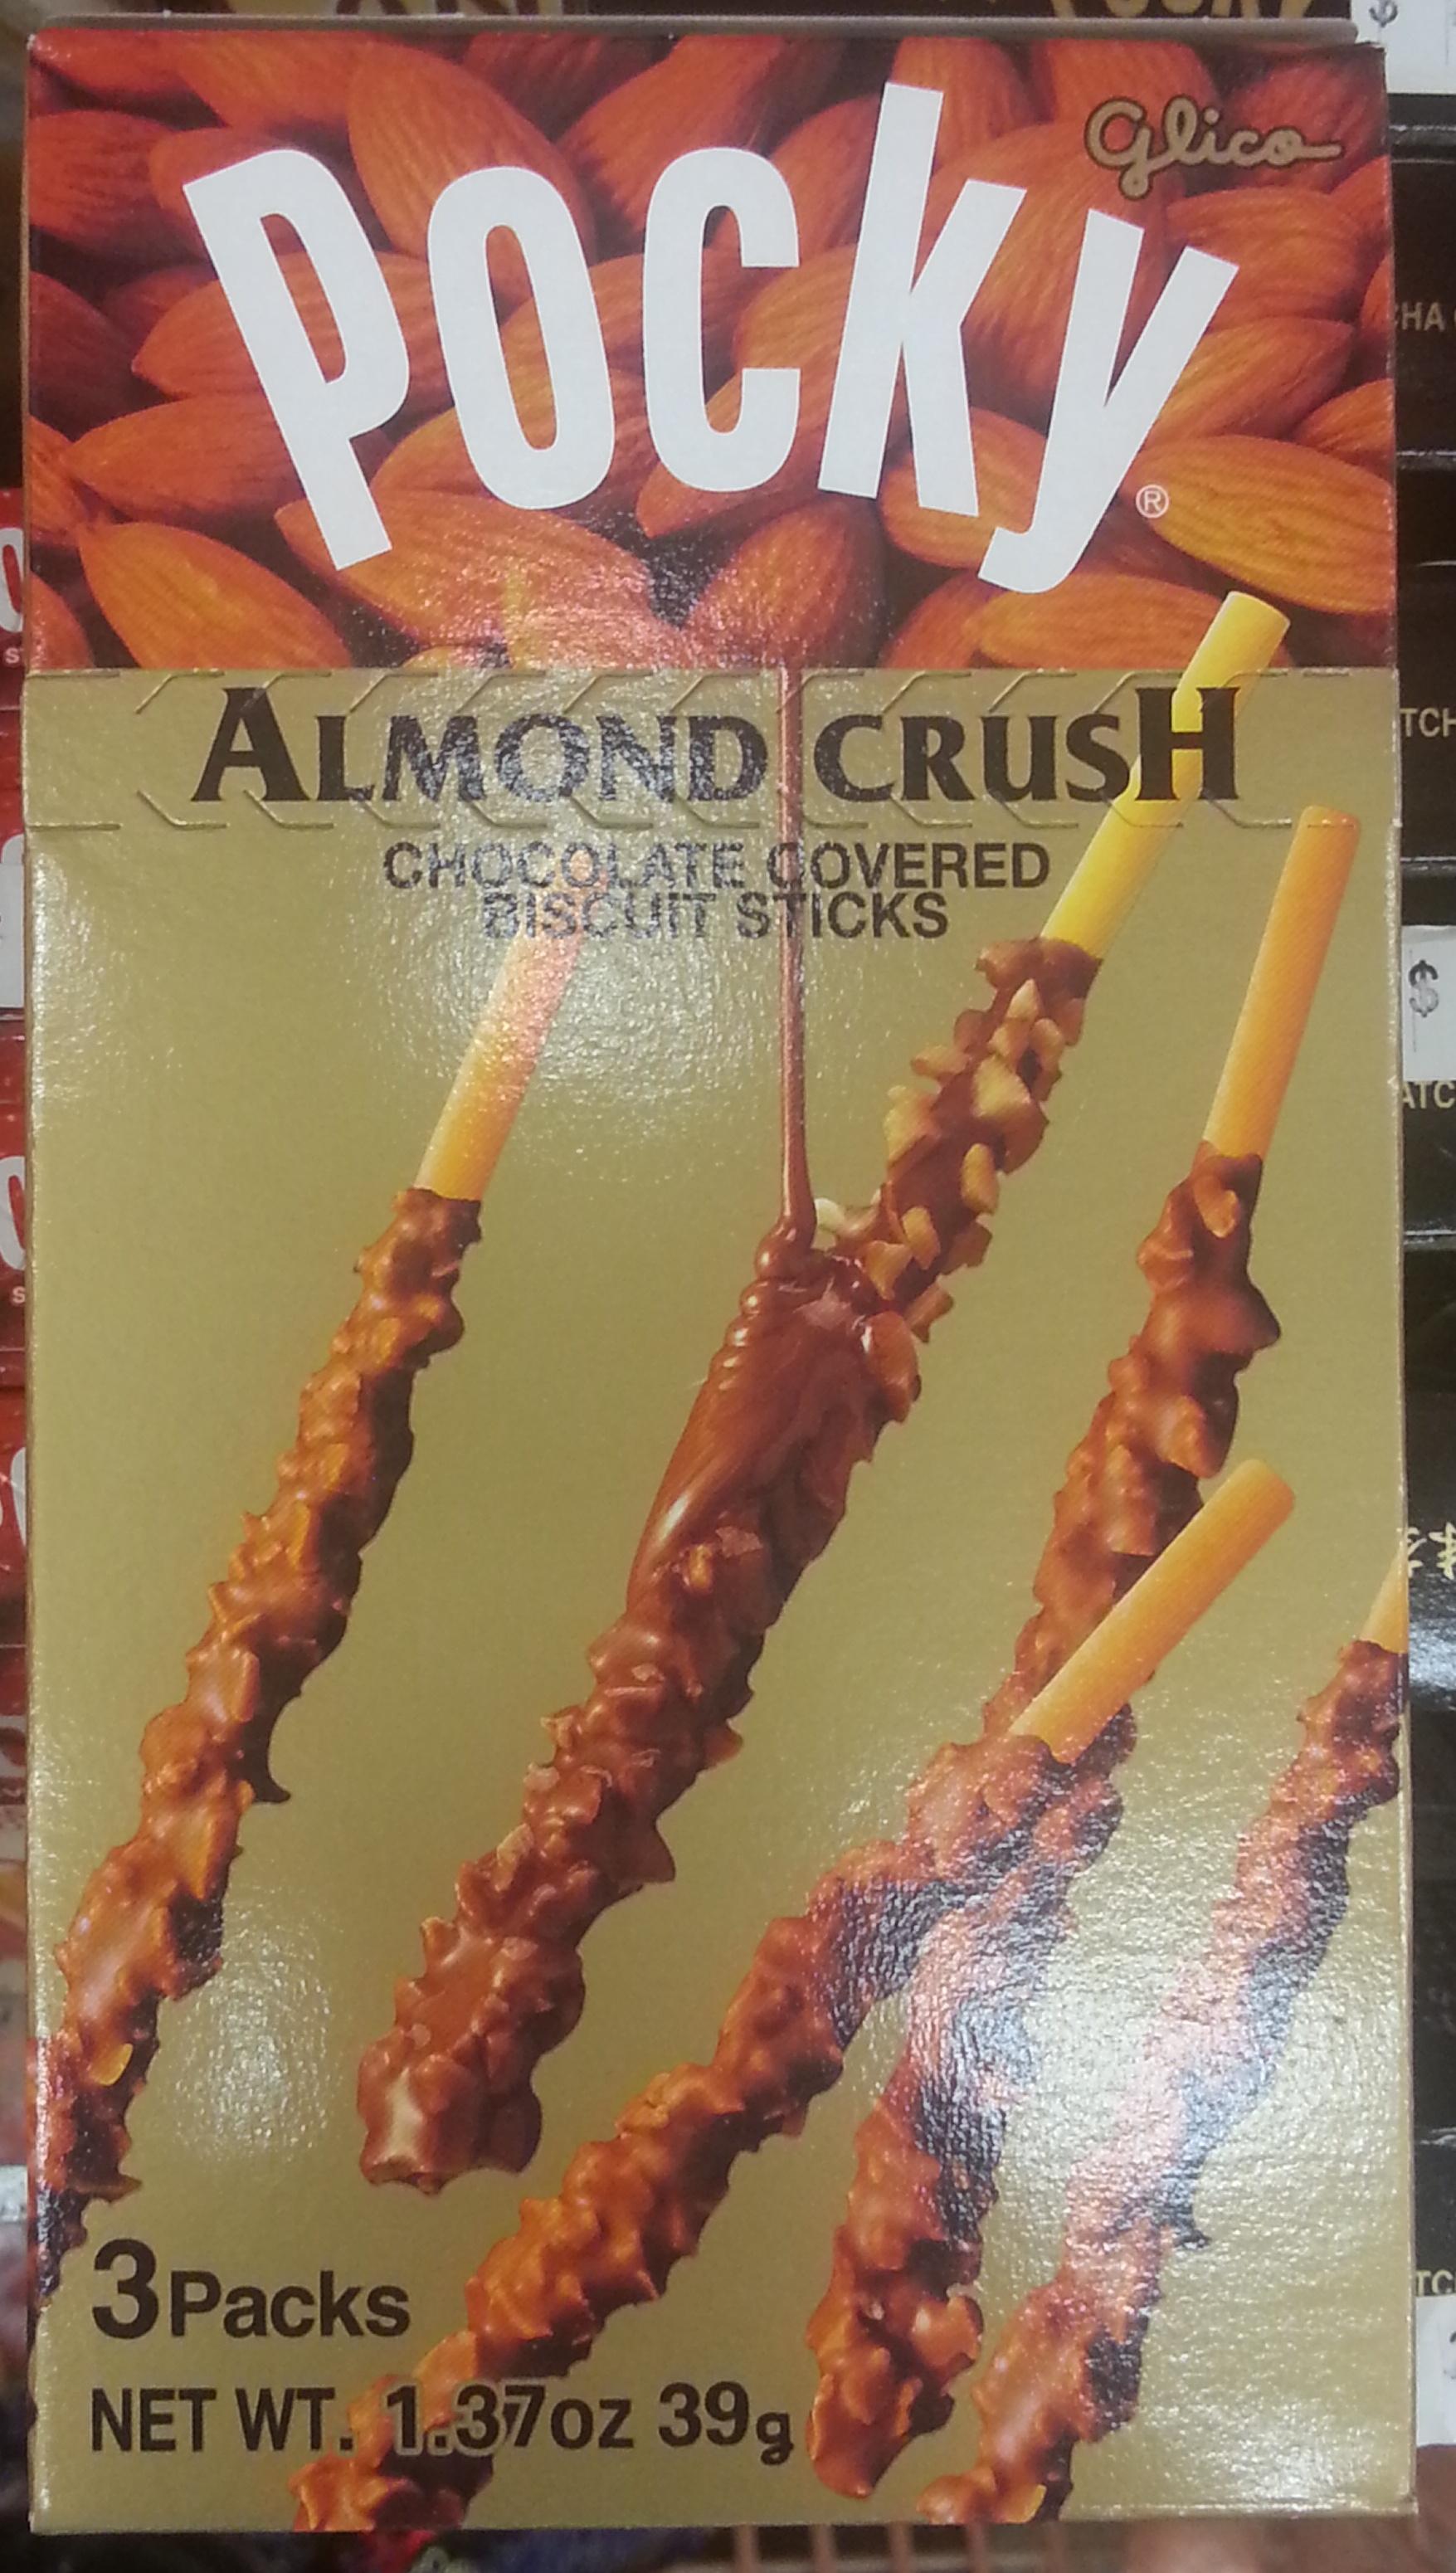 Pocky Almond Crush - Product